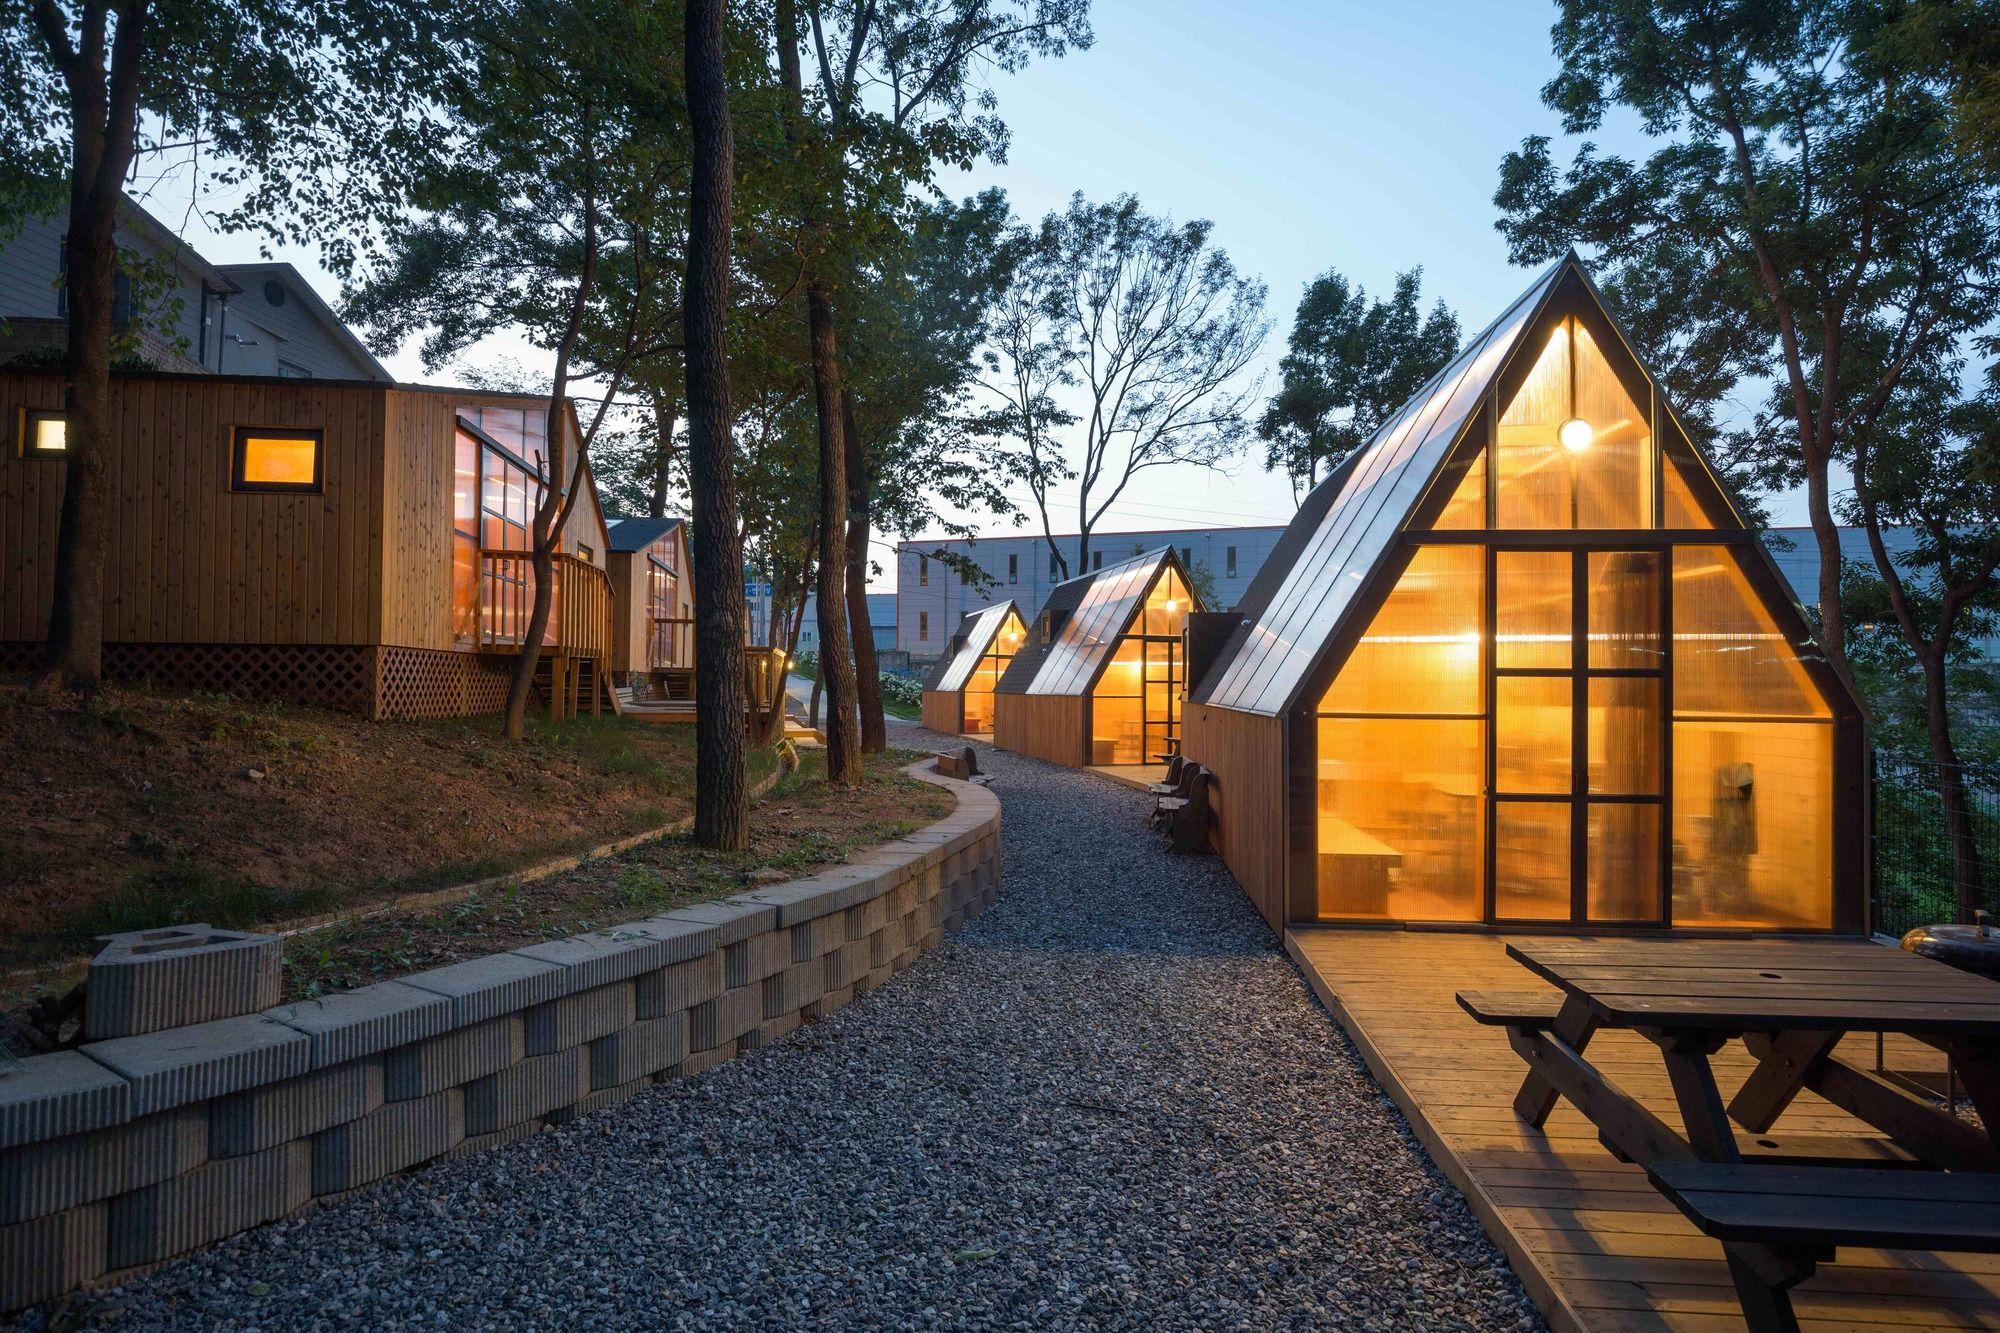 Haru Cafe B U S Architecture Architecture Architecture Details Village Houses